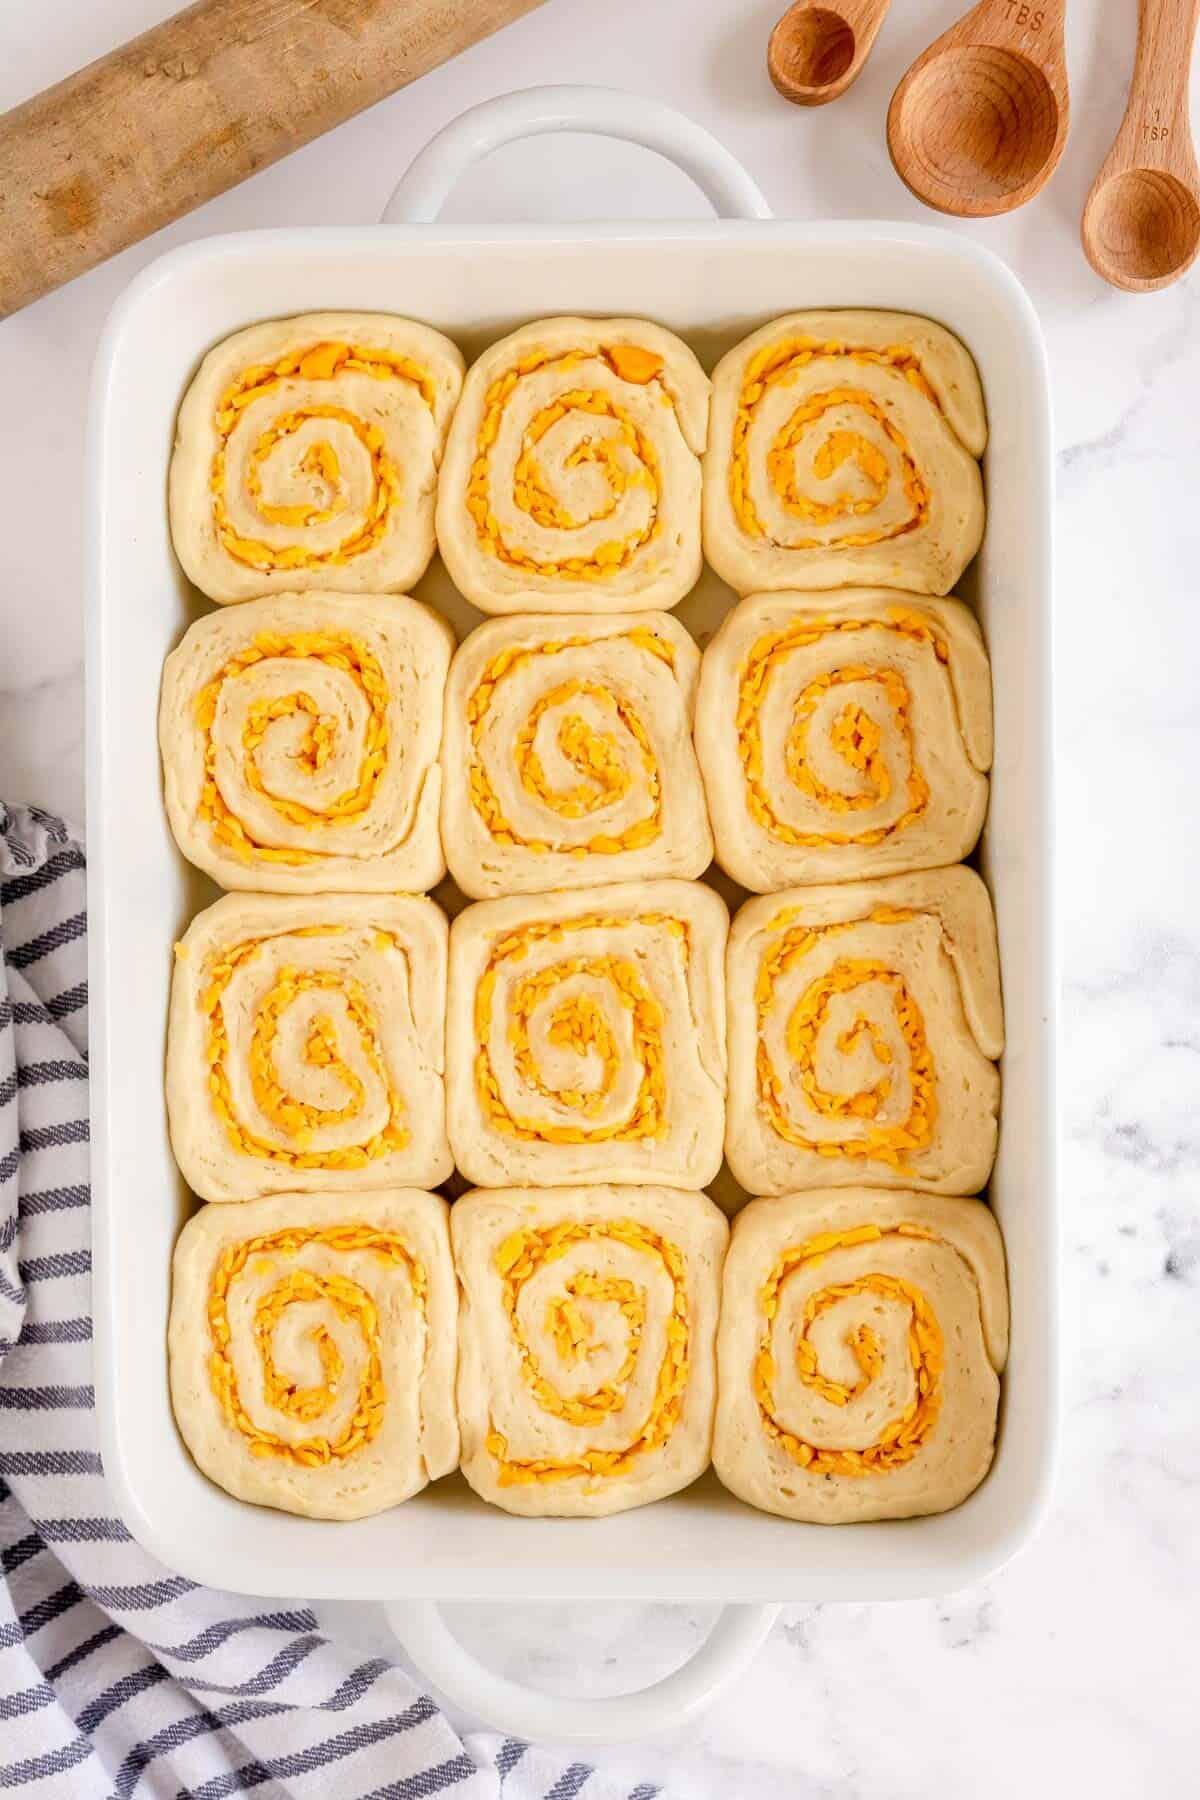 fully risen garlic rolls ready to bake